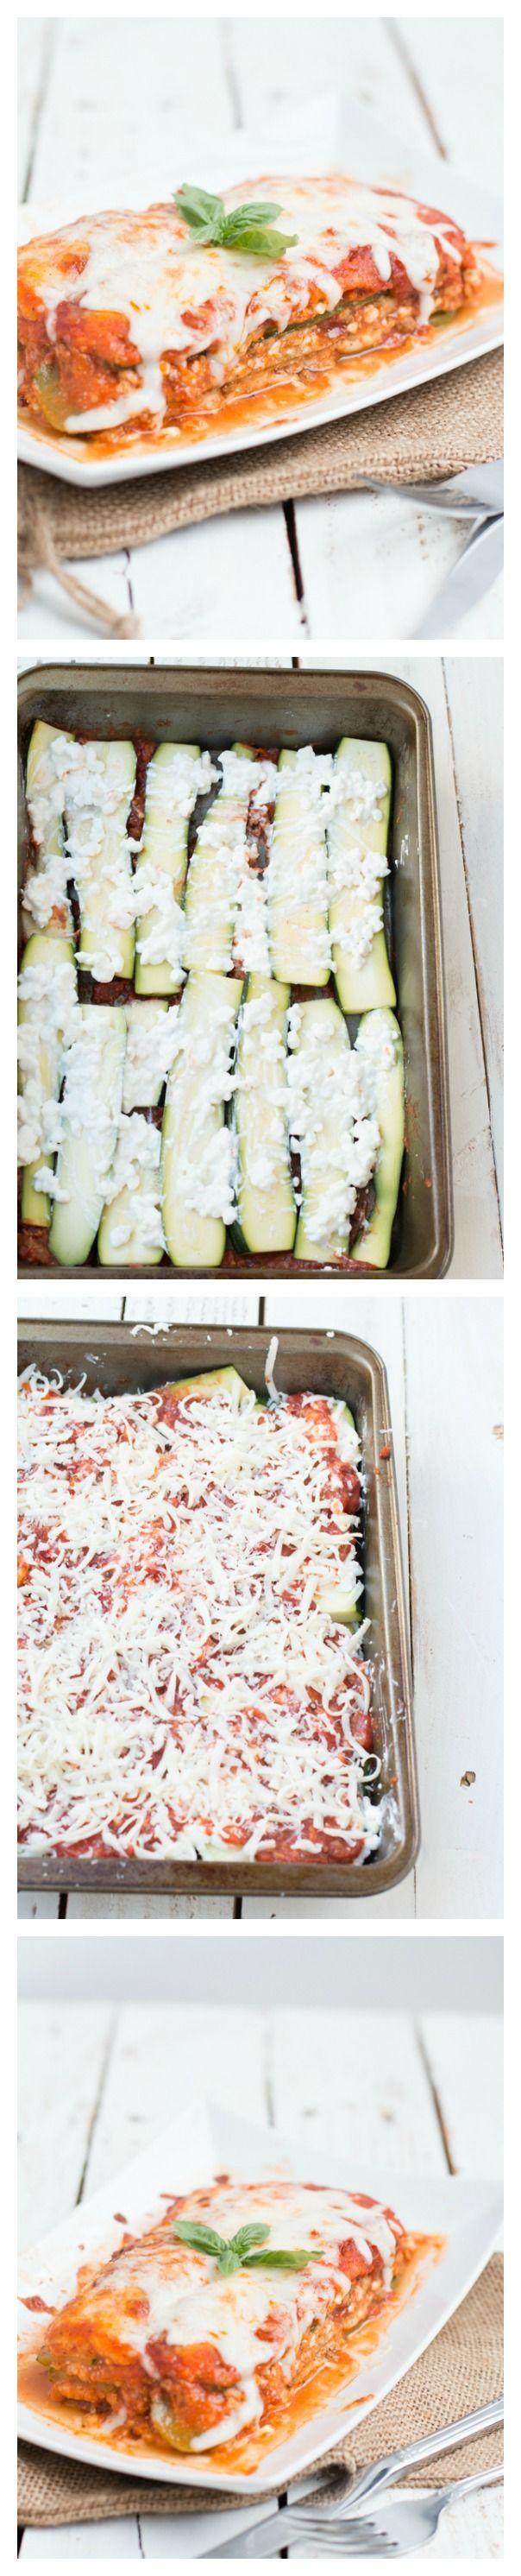 How to make perfect zucchini lasagna.